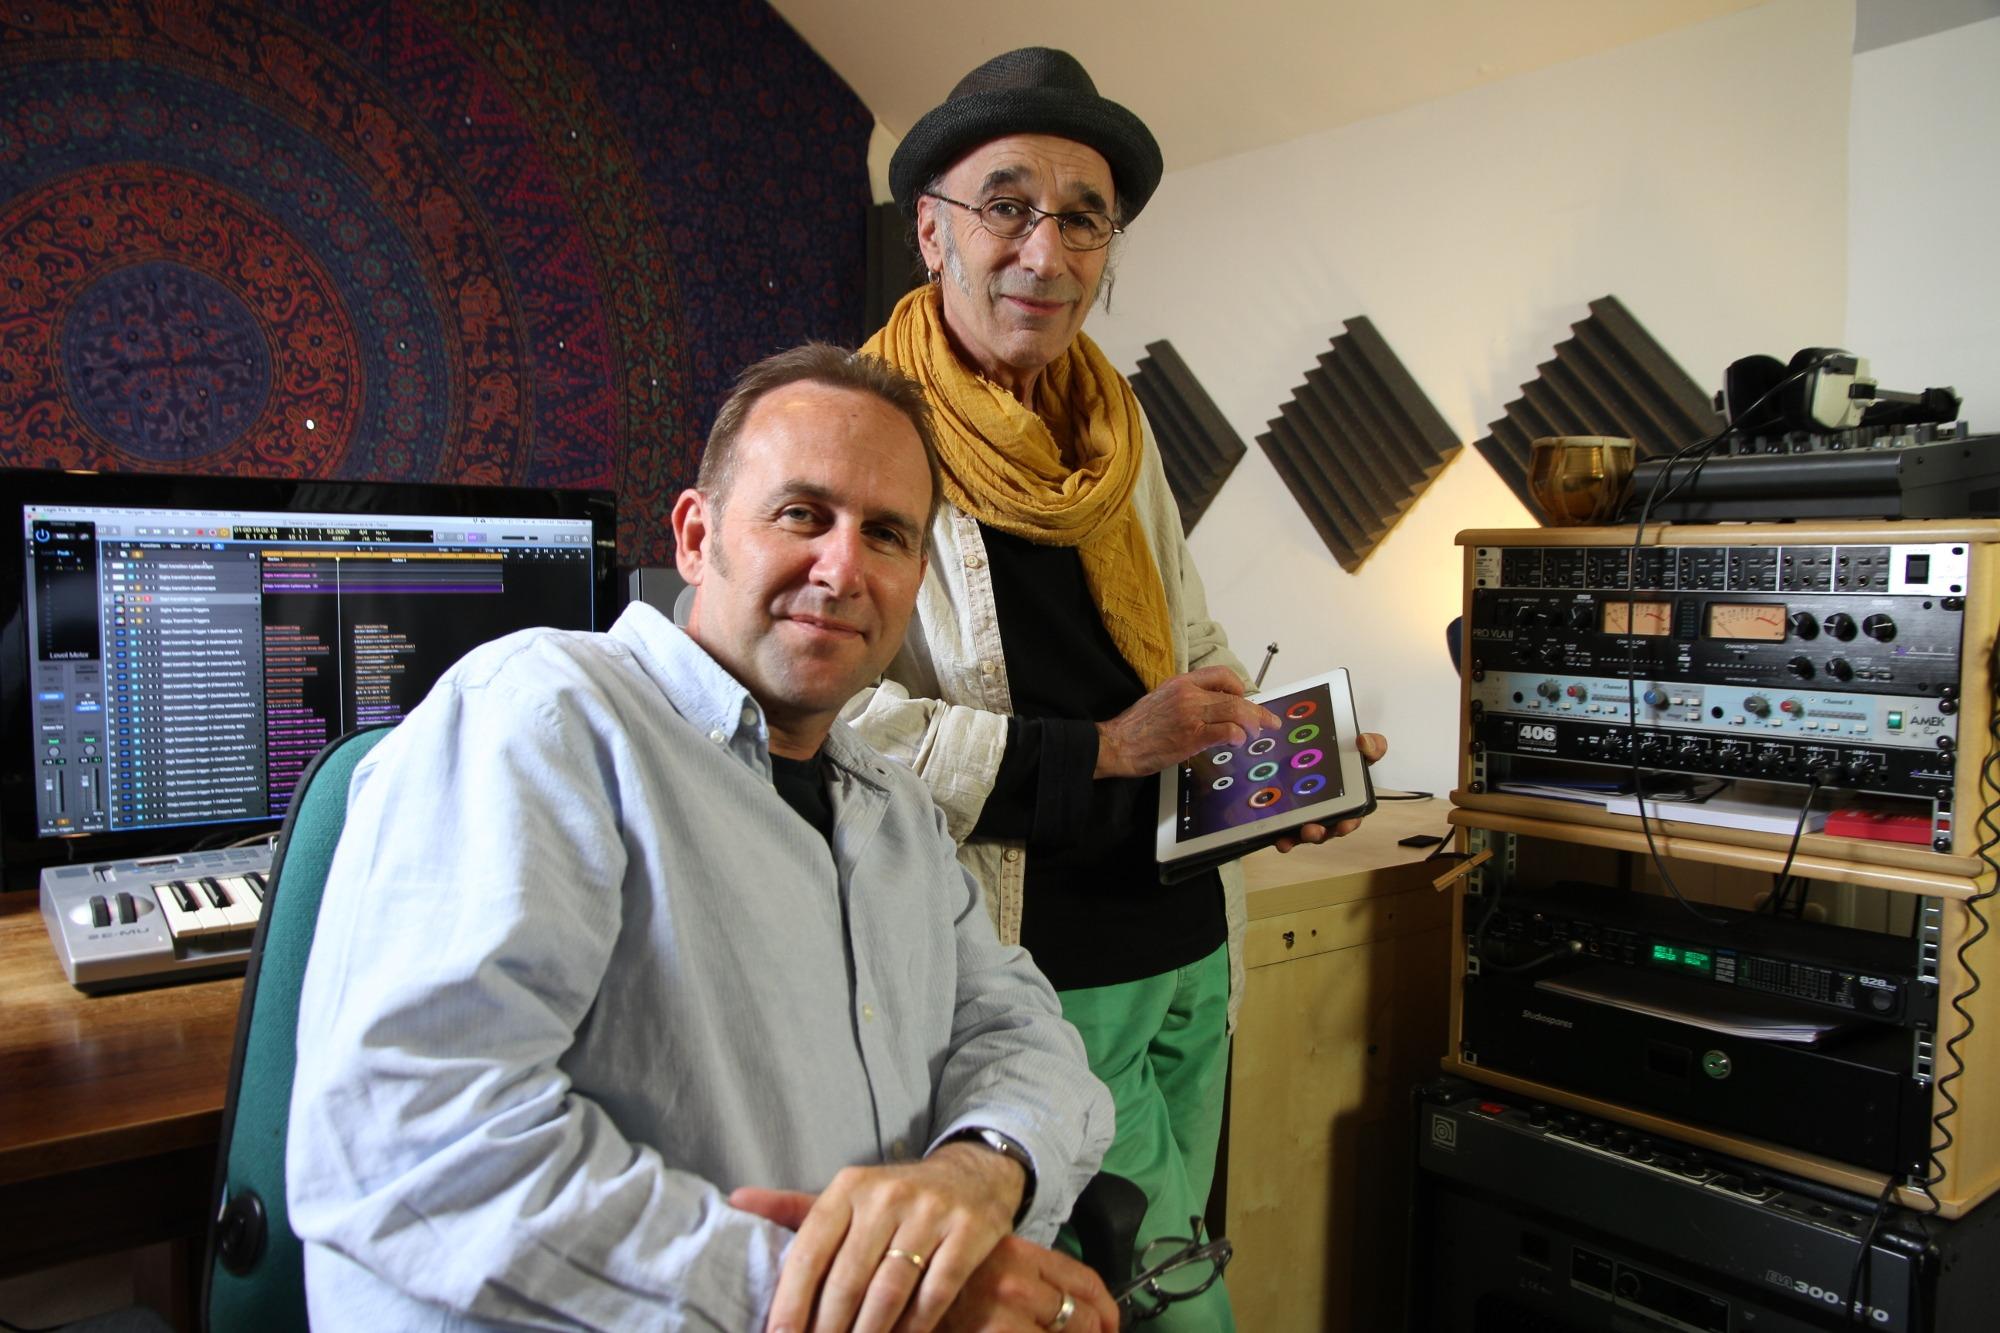 Bristol musicians develop app to enrich lives of dementia sufferers